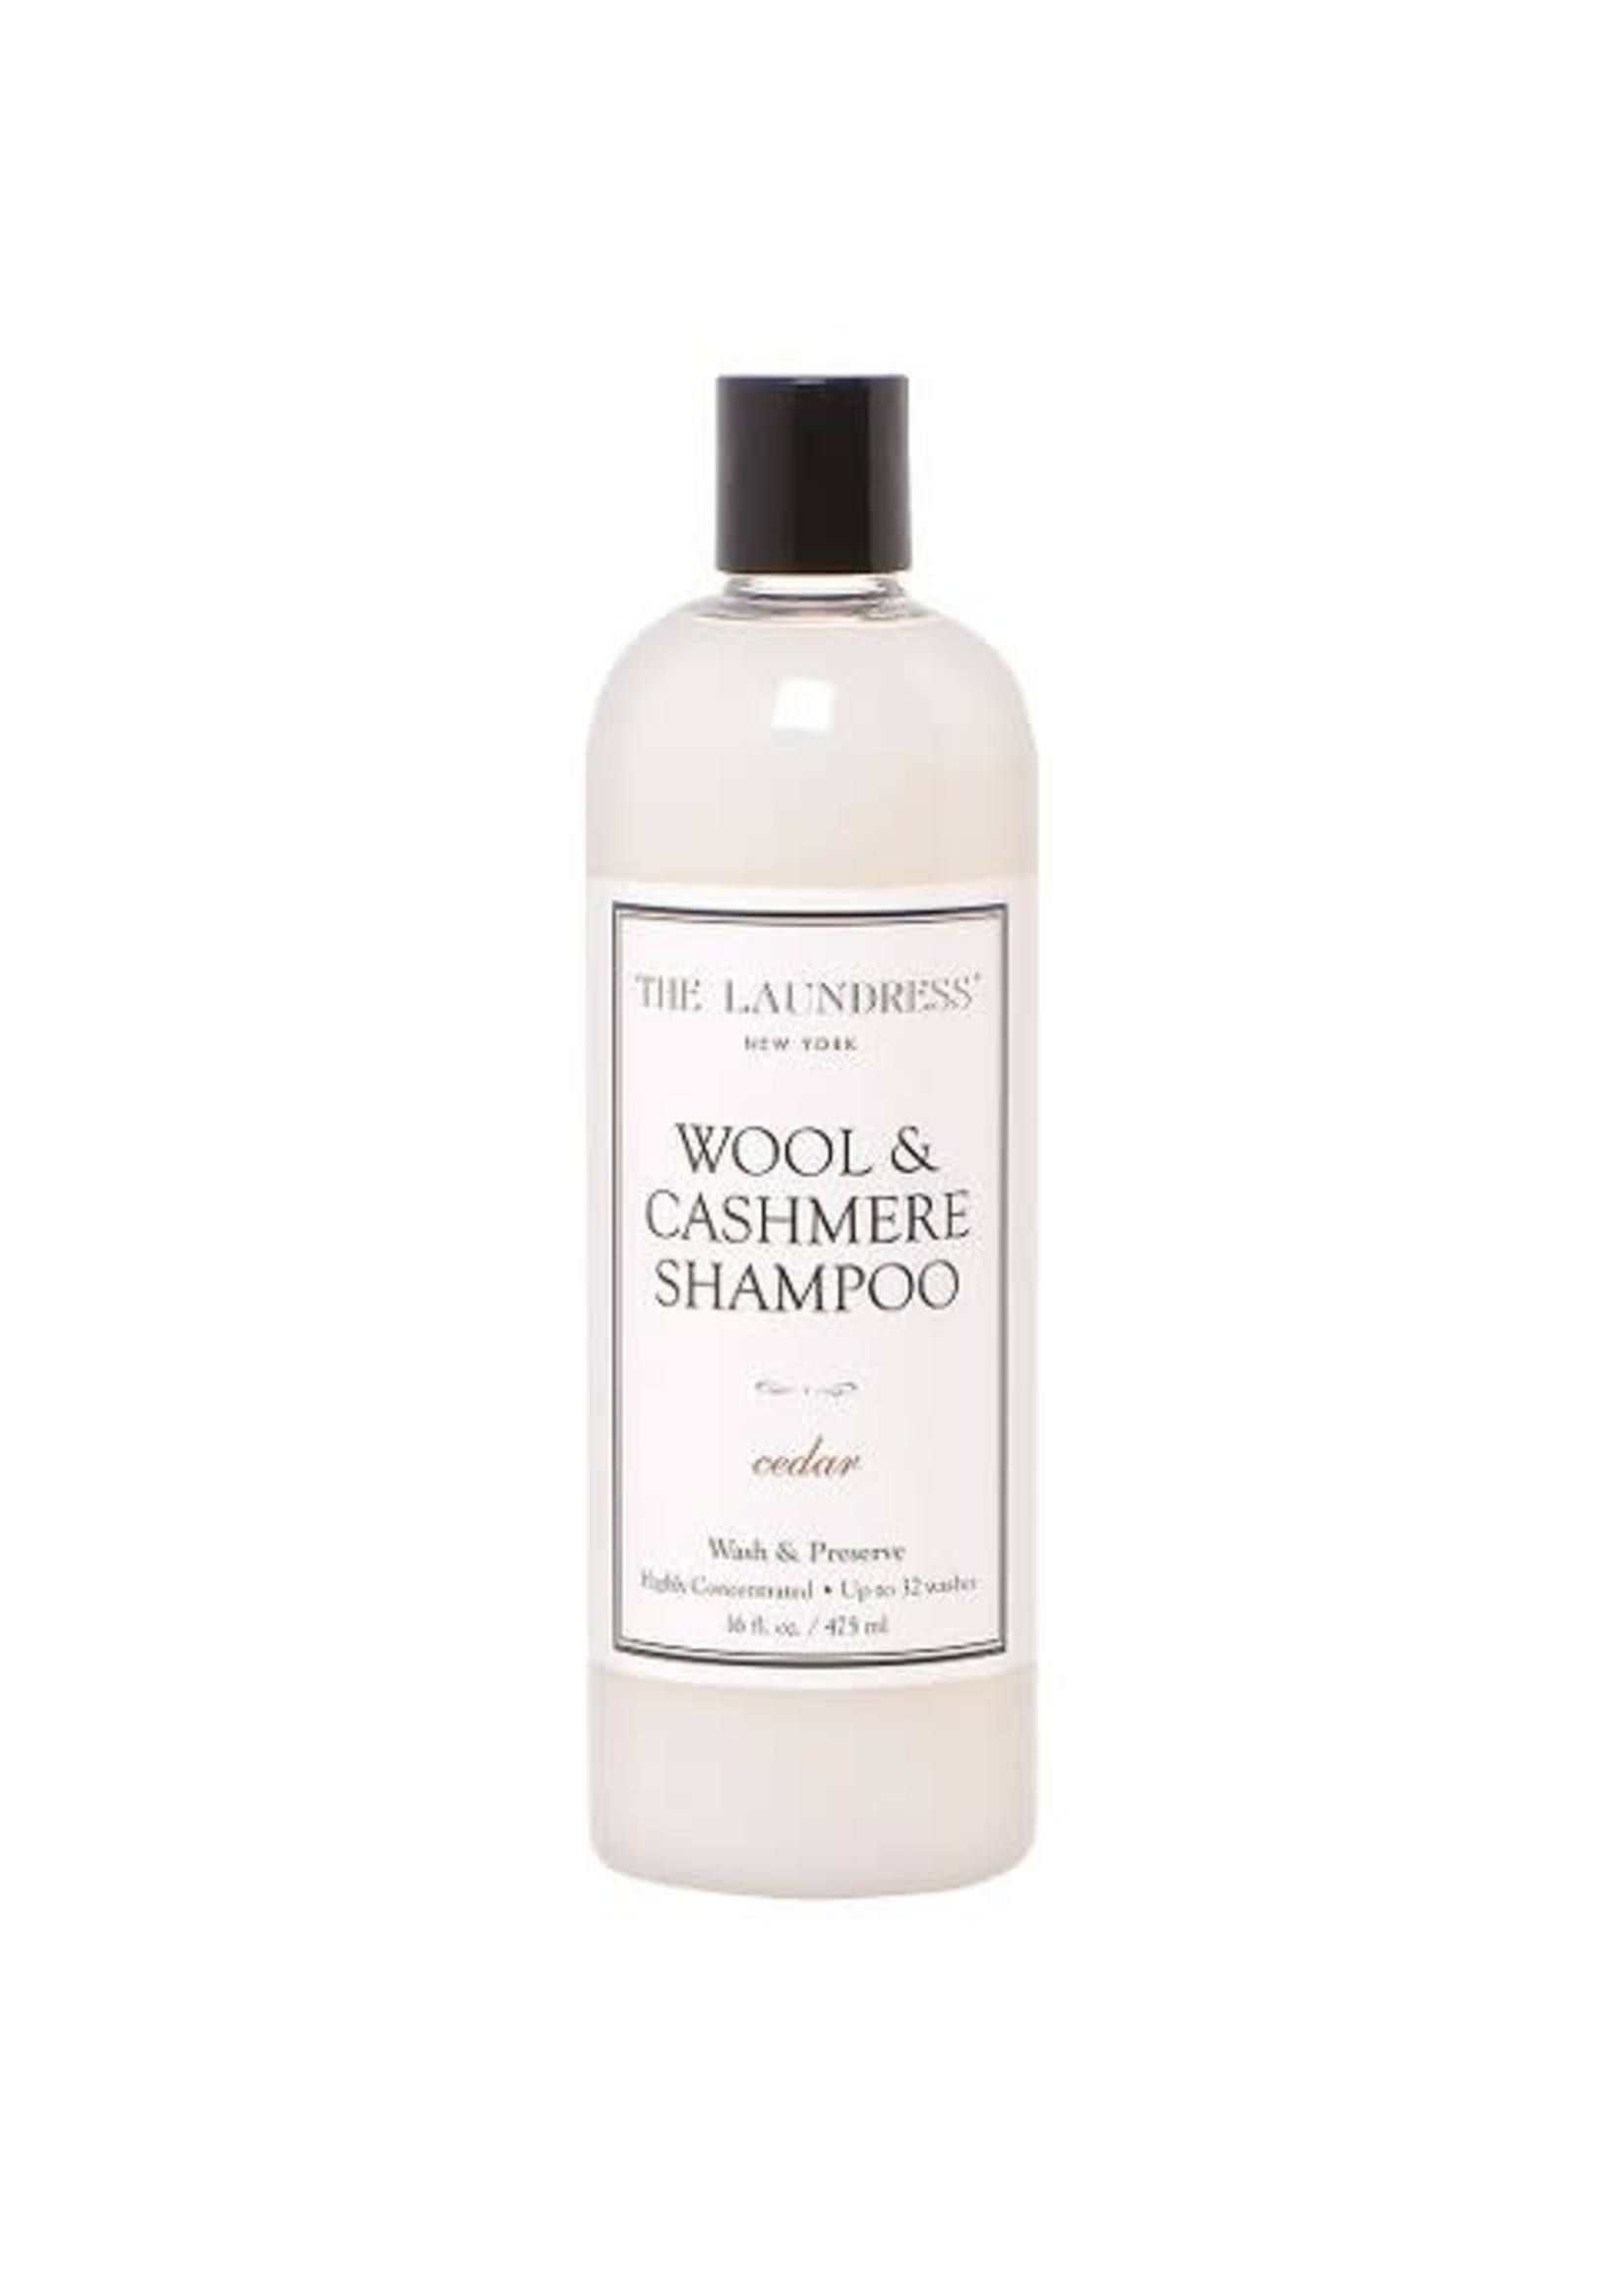 Laundress laundress Wool & Cashmere Shampoo